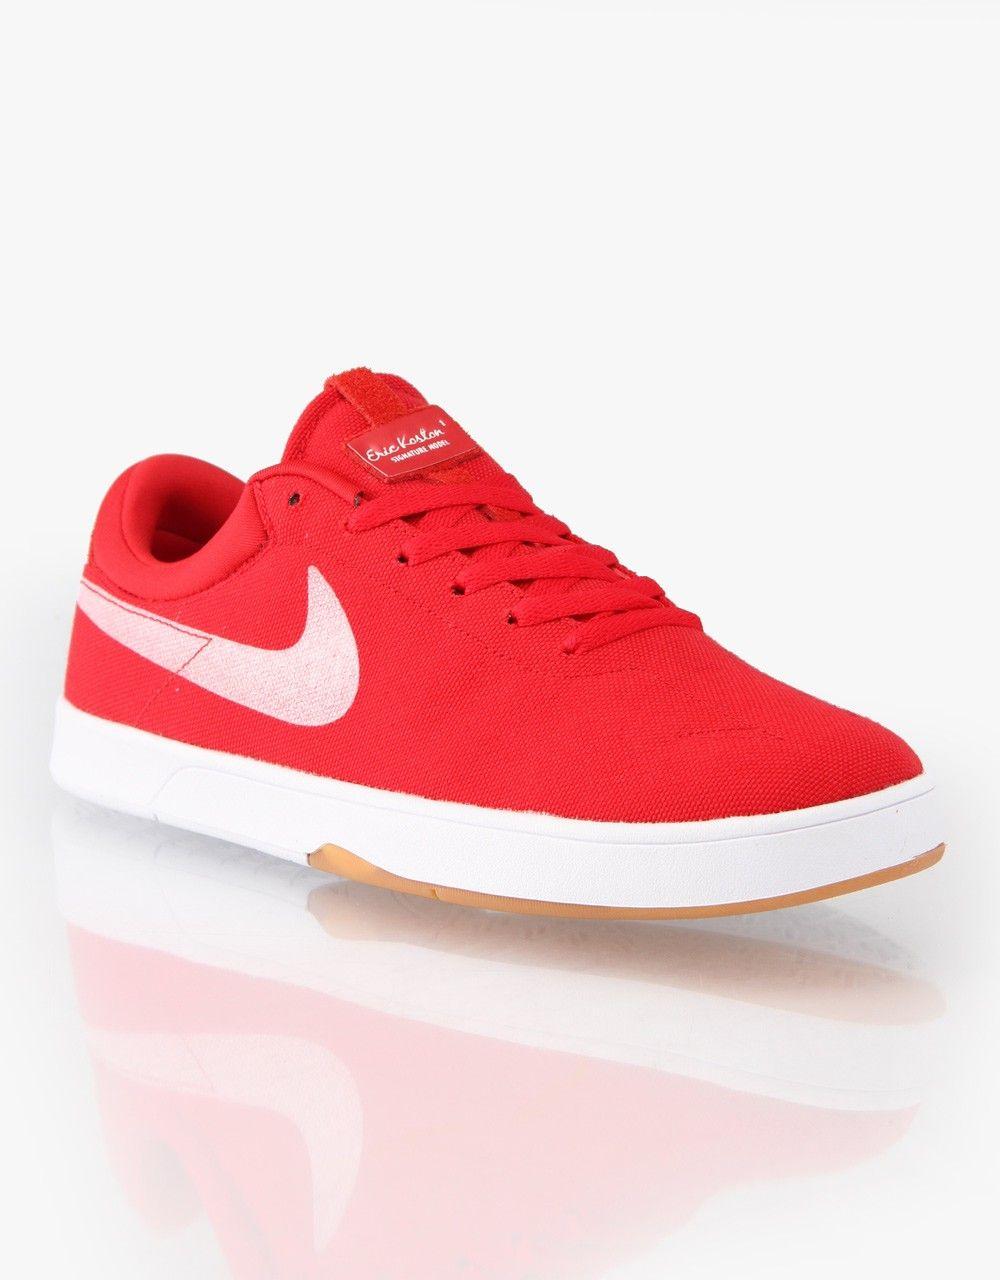 Nike Skateboarding Eric Koston 1 Skate Shoe · Nike SkateboardingNike SbSkate  ...